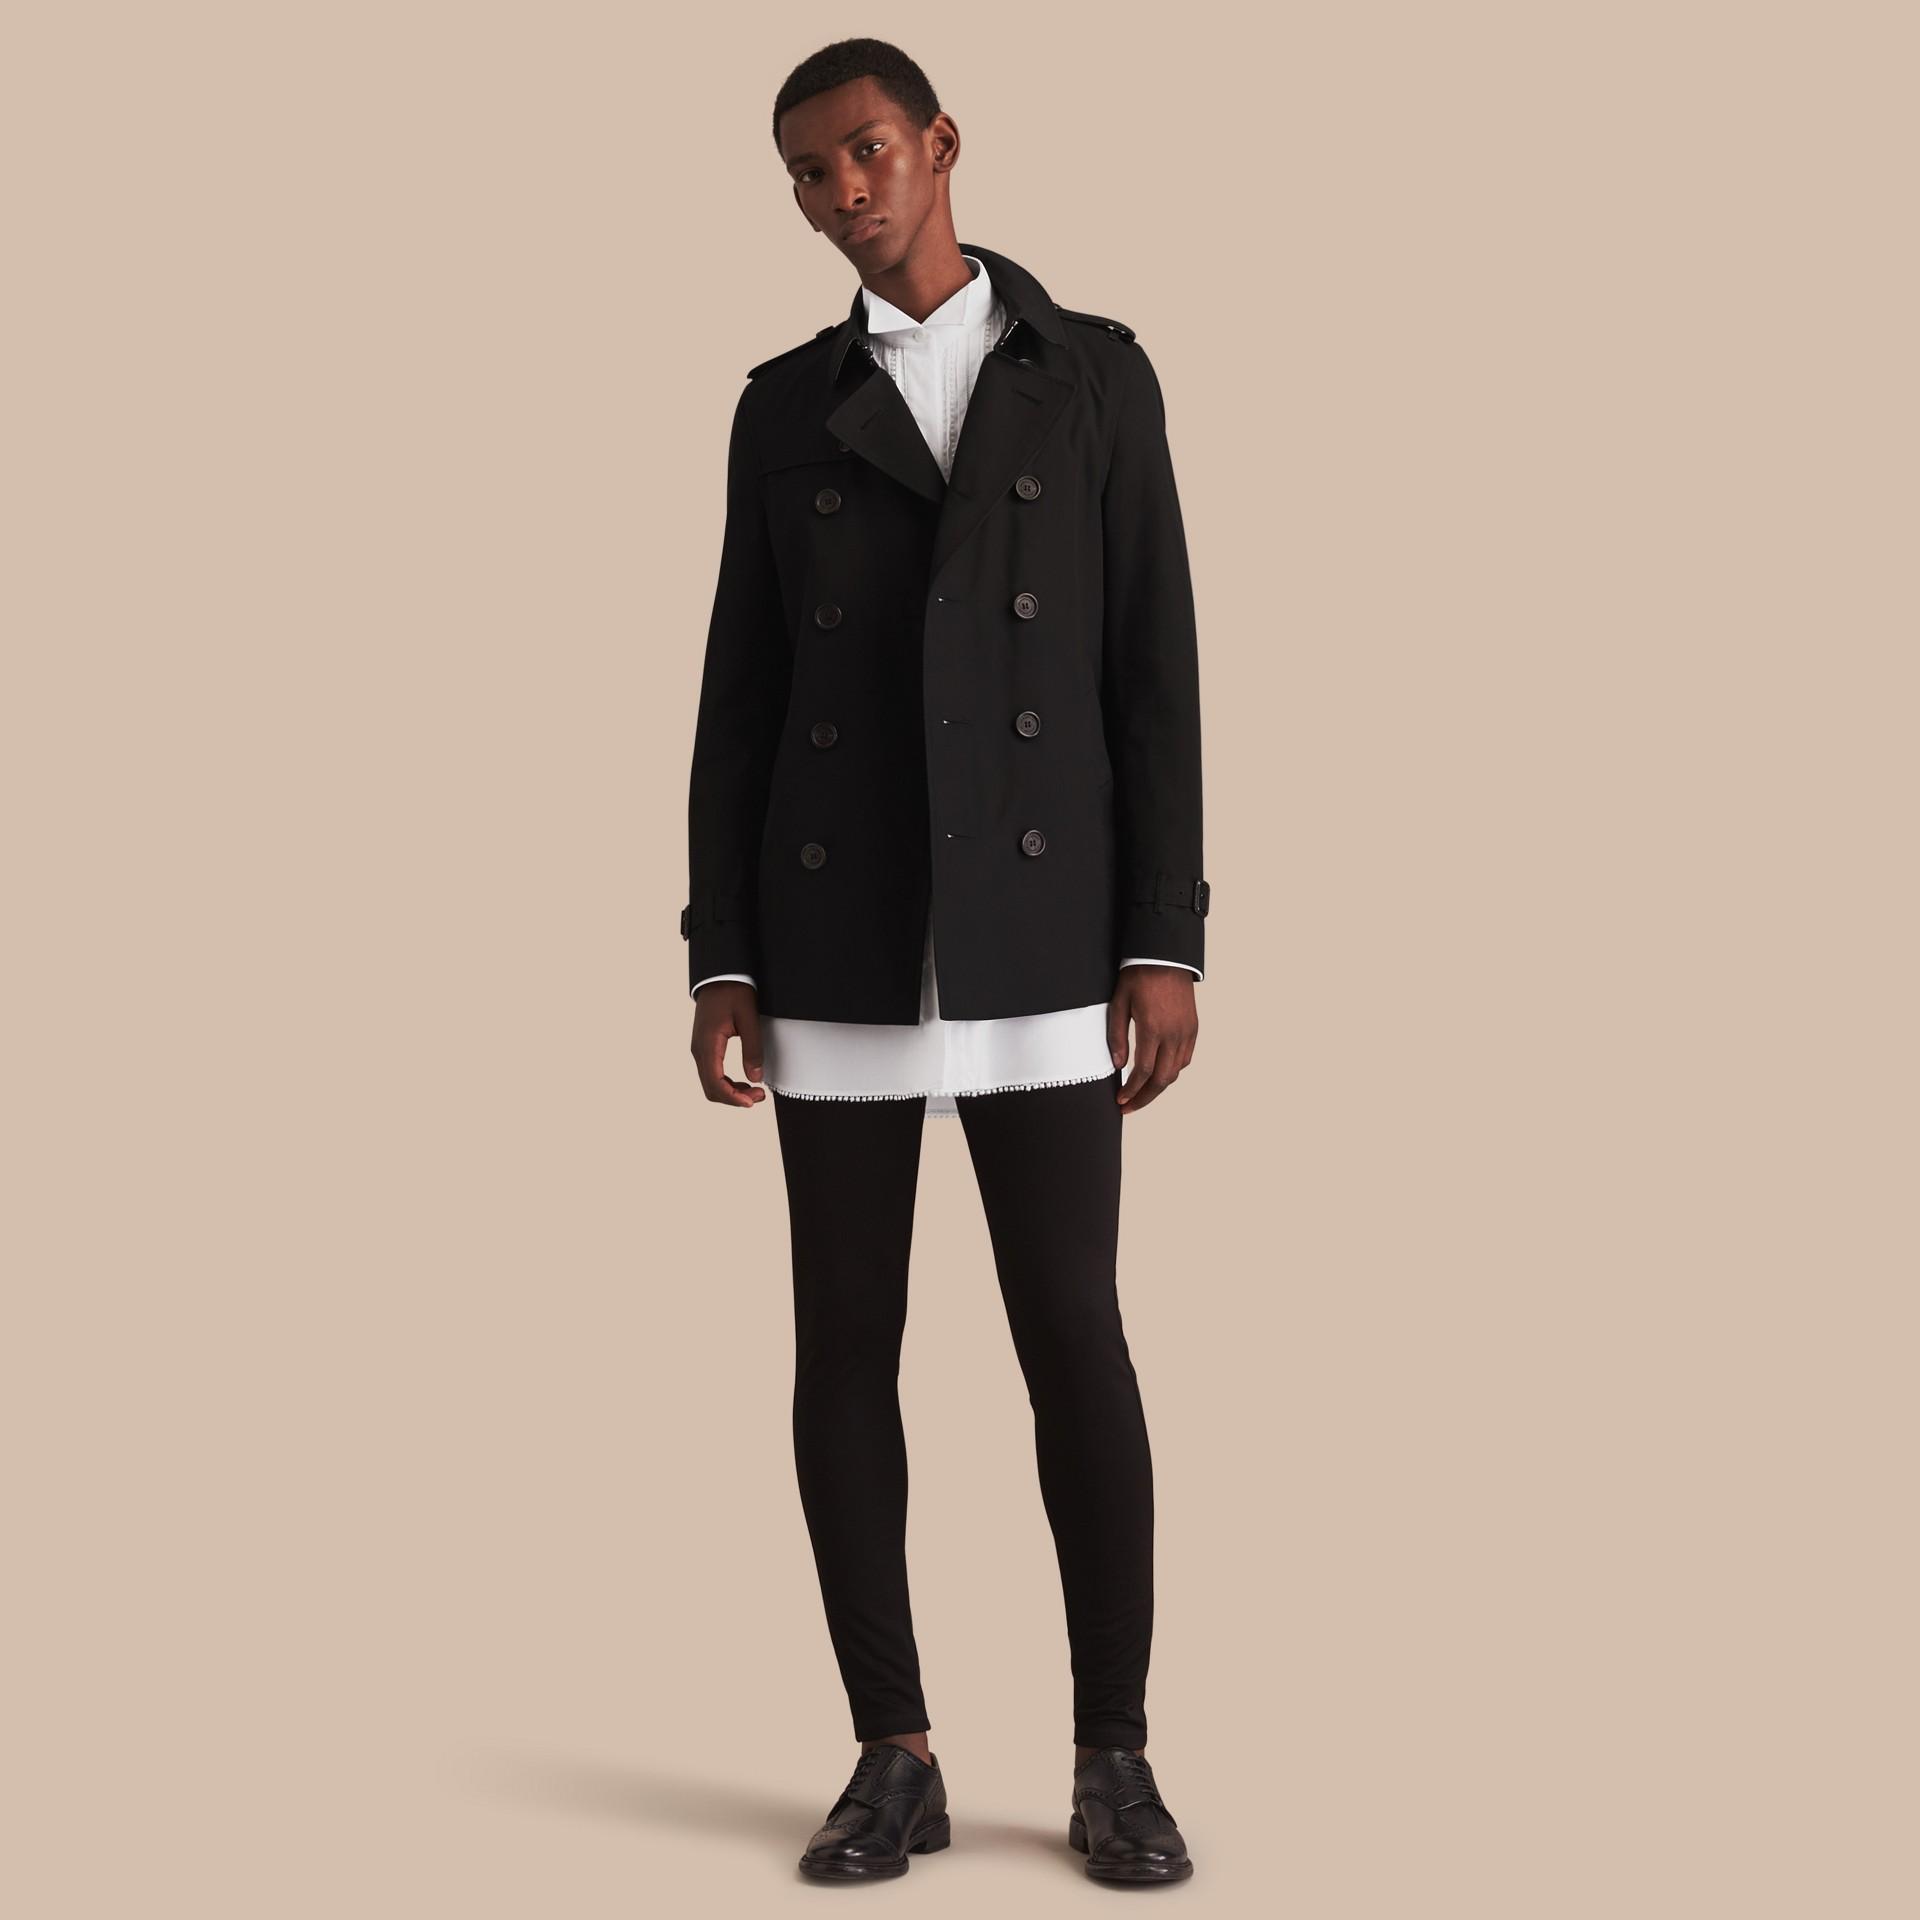 Negro Trench coat Chelsea – Trench coat Heritage corto Negro - imagen de la galería 1